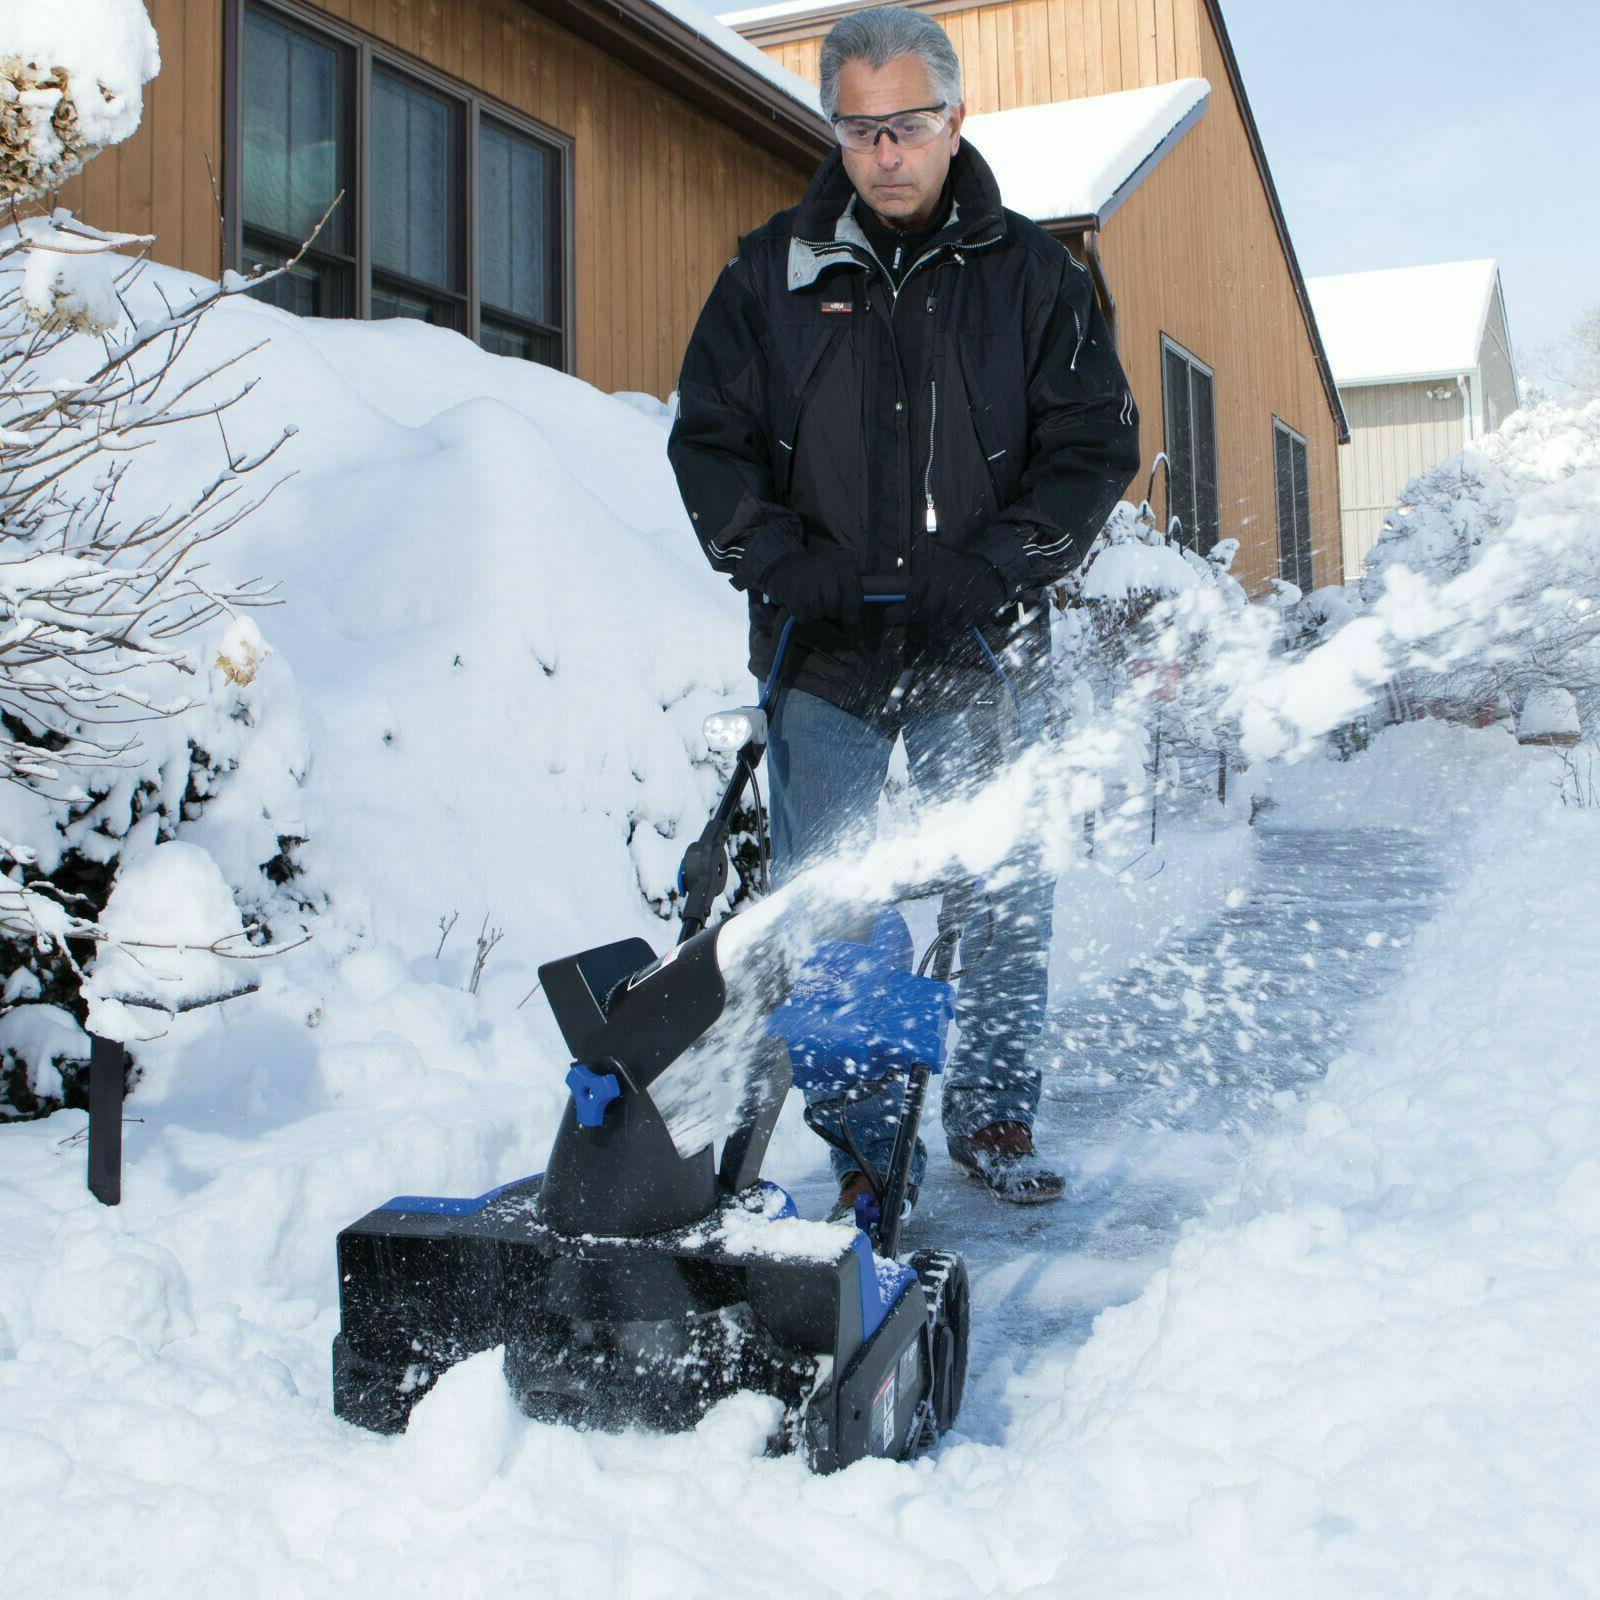 Snow Joe Snow Blower |